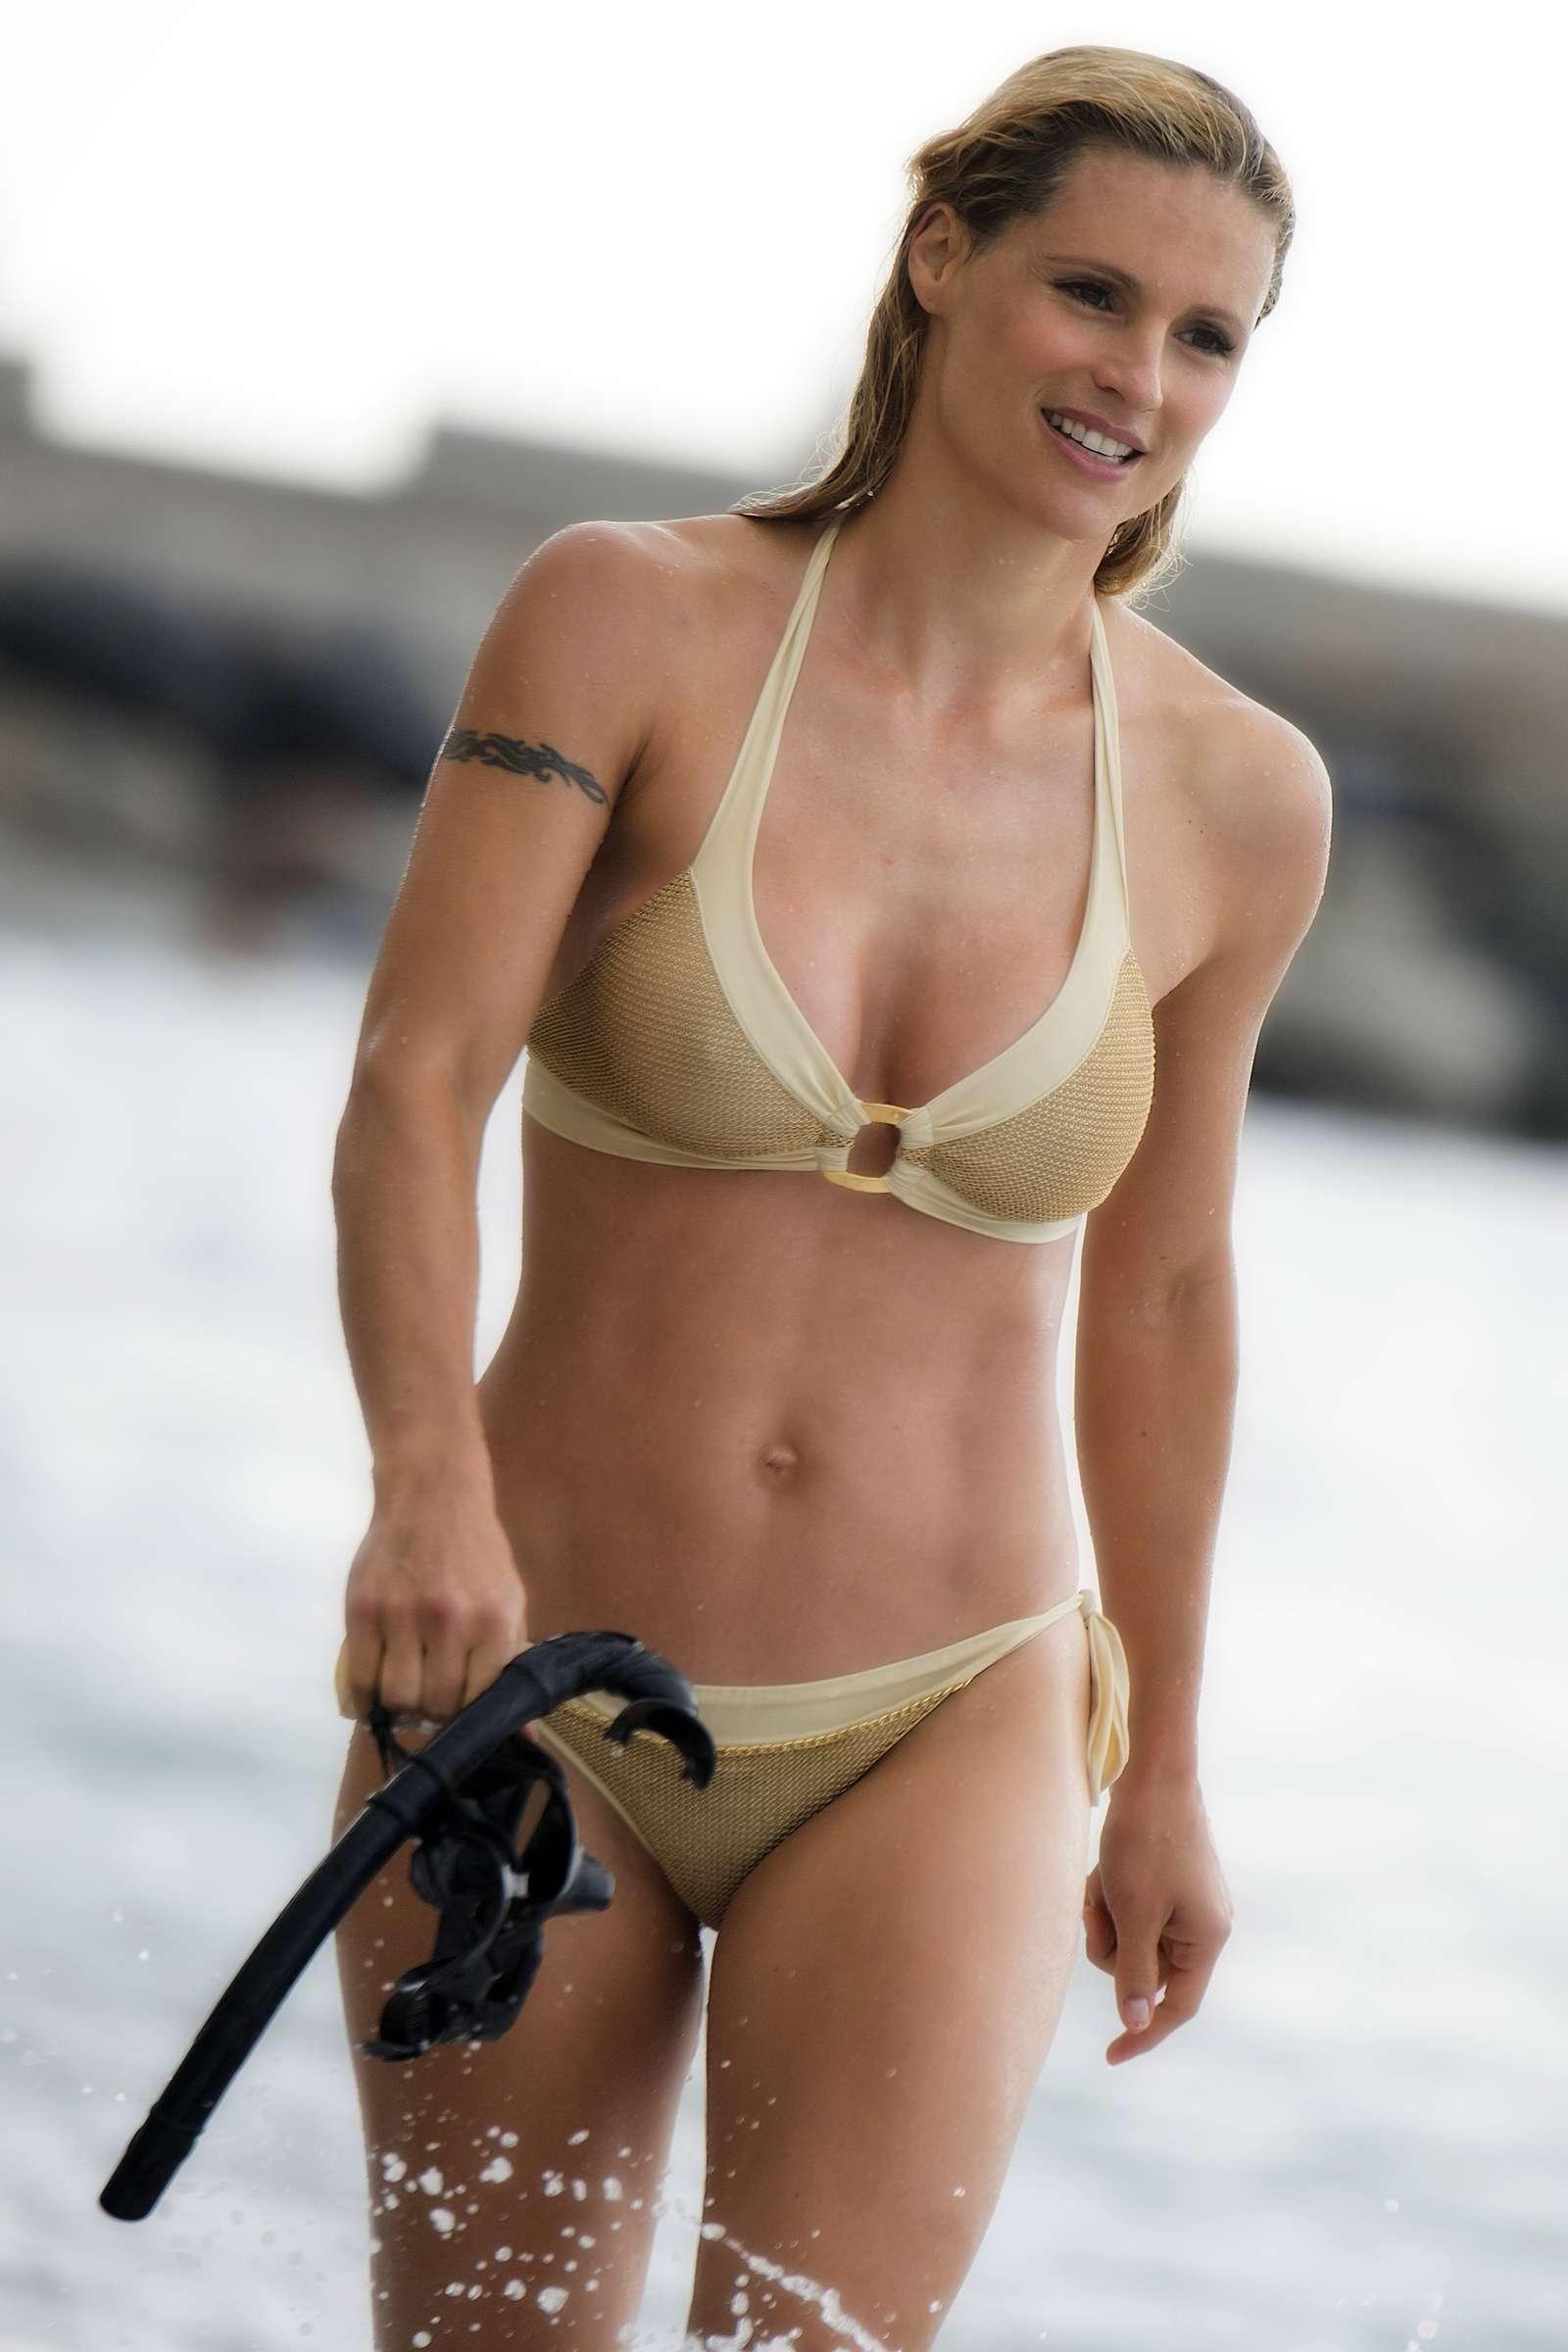 Milf Im Bikini